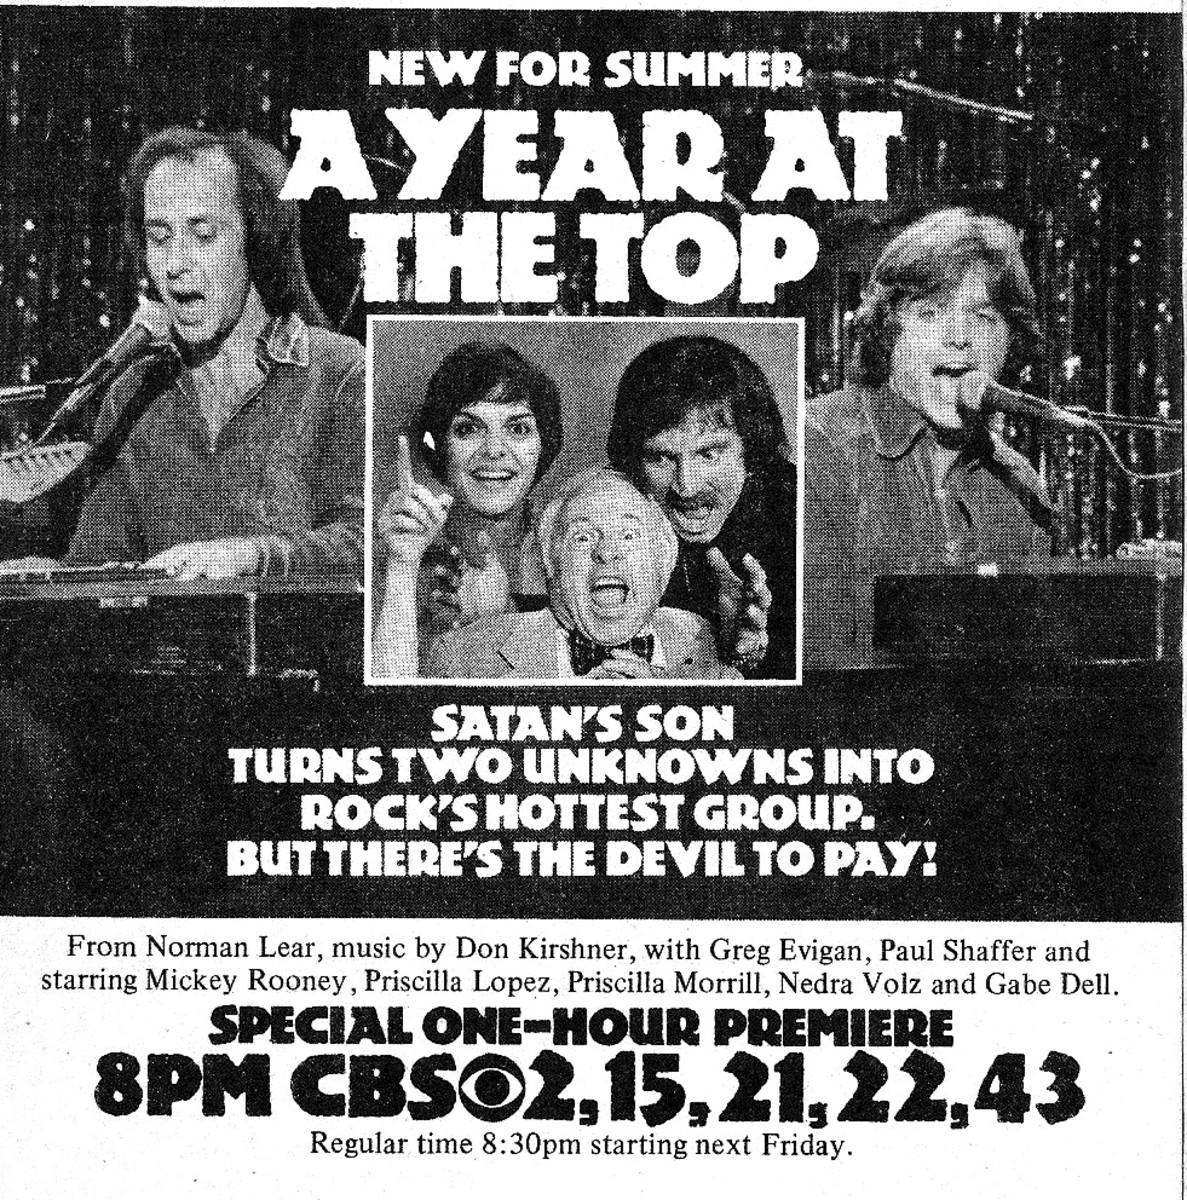 Vintage TV Guide ad 1977